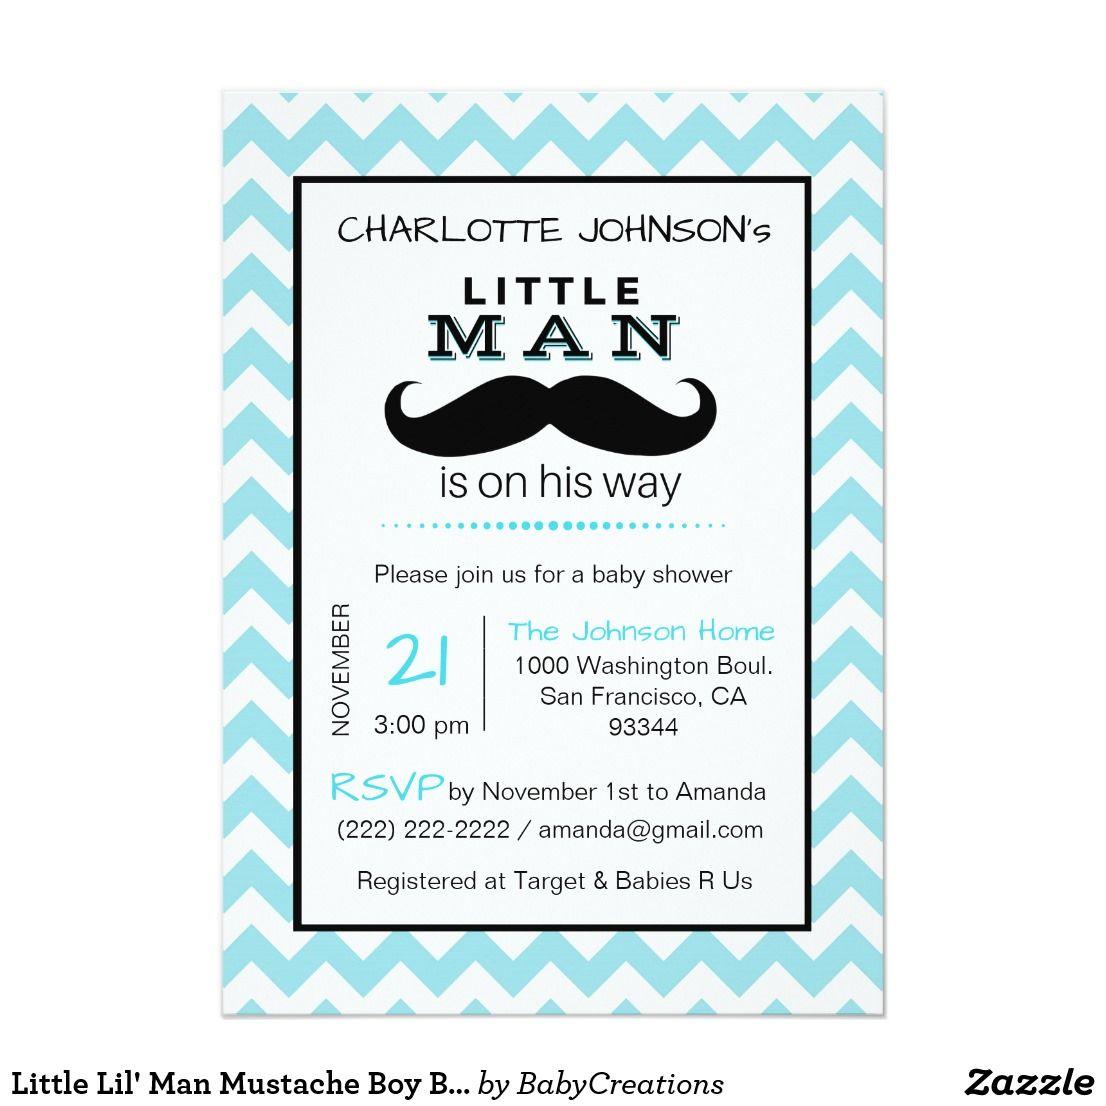 Little lil man mustache boy blue baby shower card shower invitations little lil man mustache boy blue baby shower card filmwisefo Choice Image